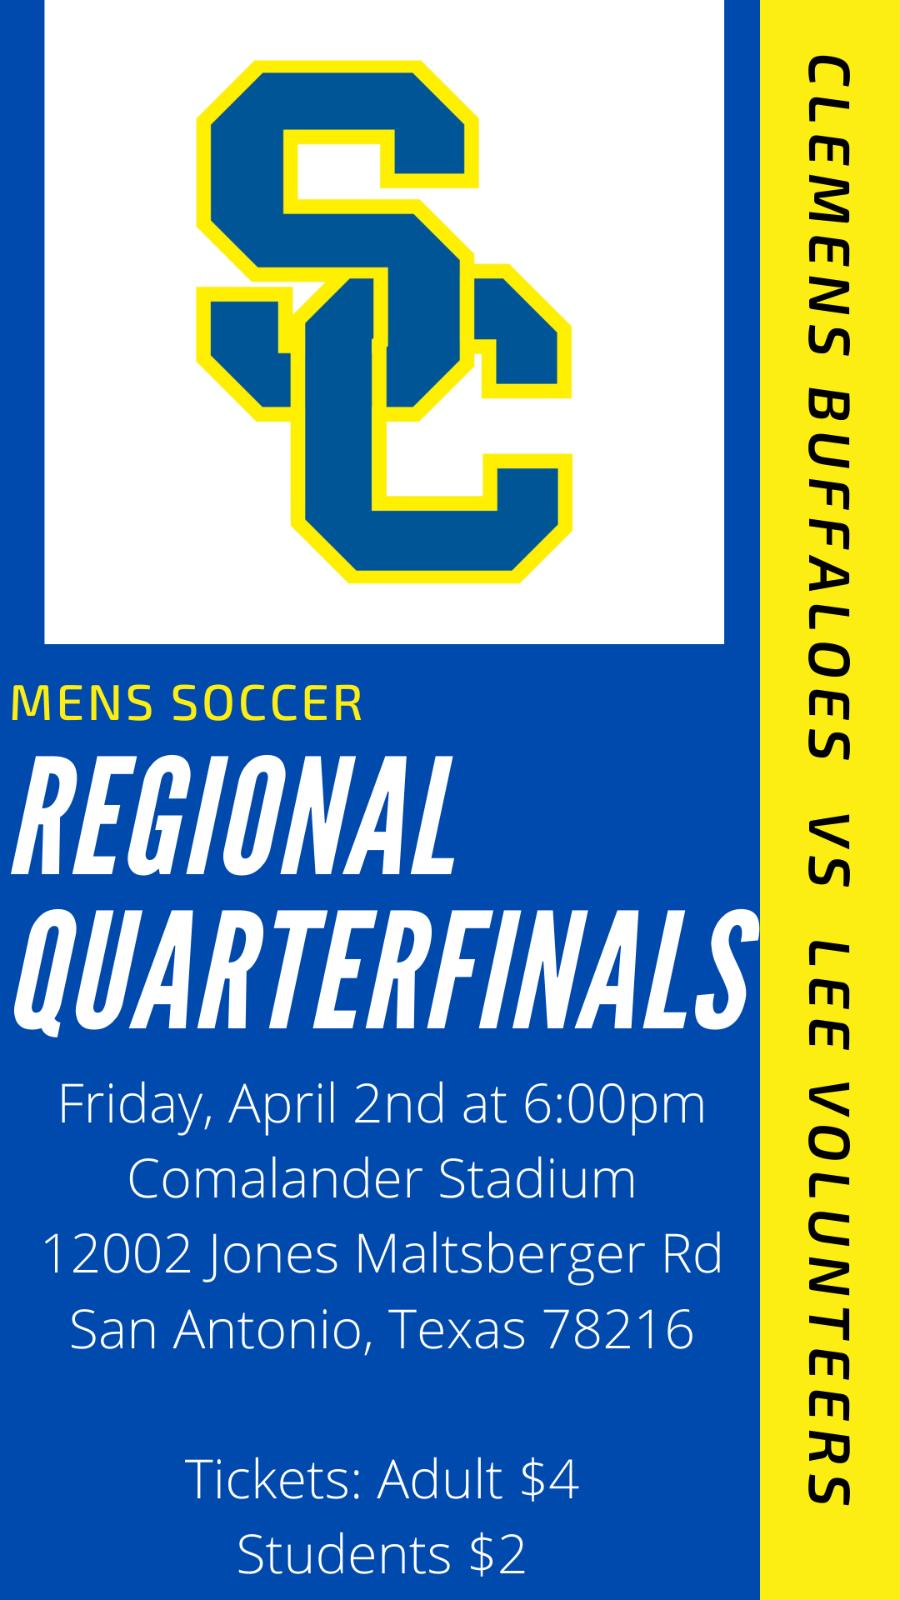 Clemens Mens Soccer Regional Quarterfinals Information